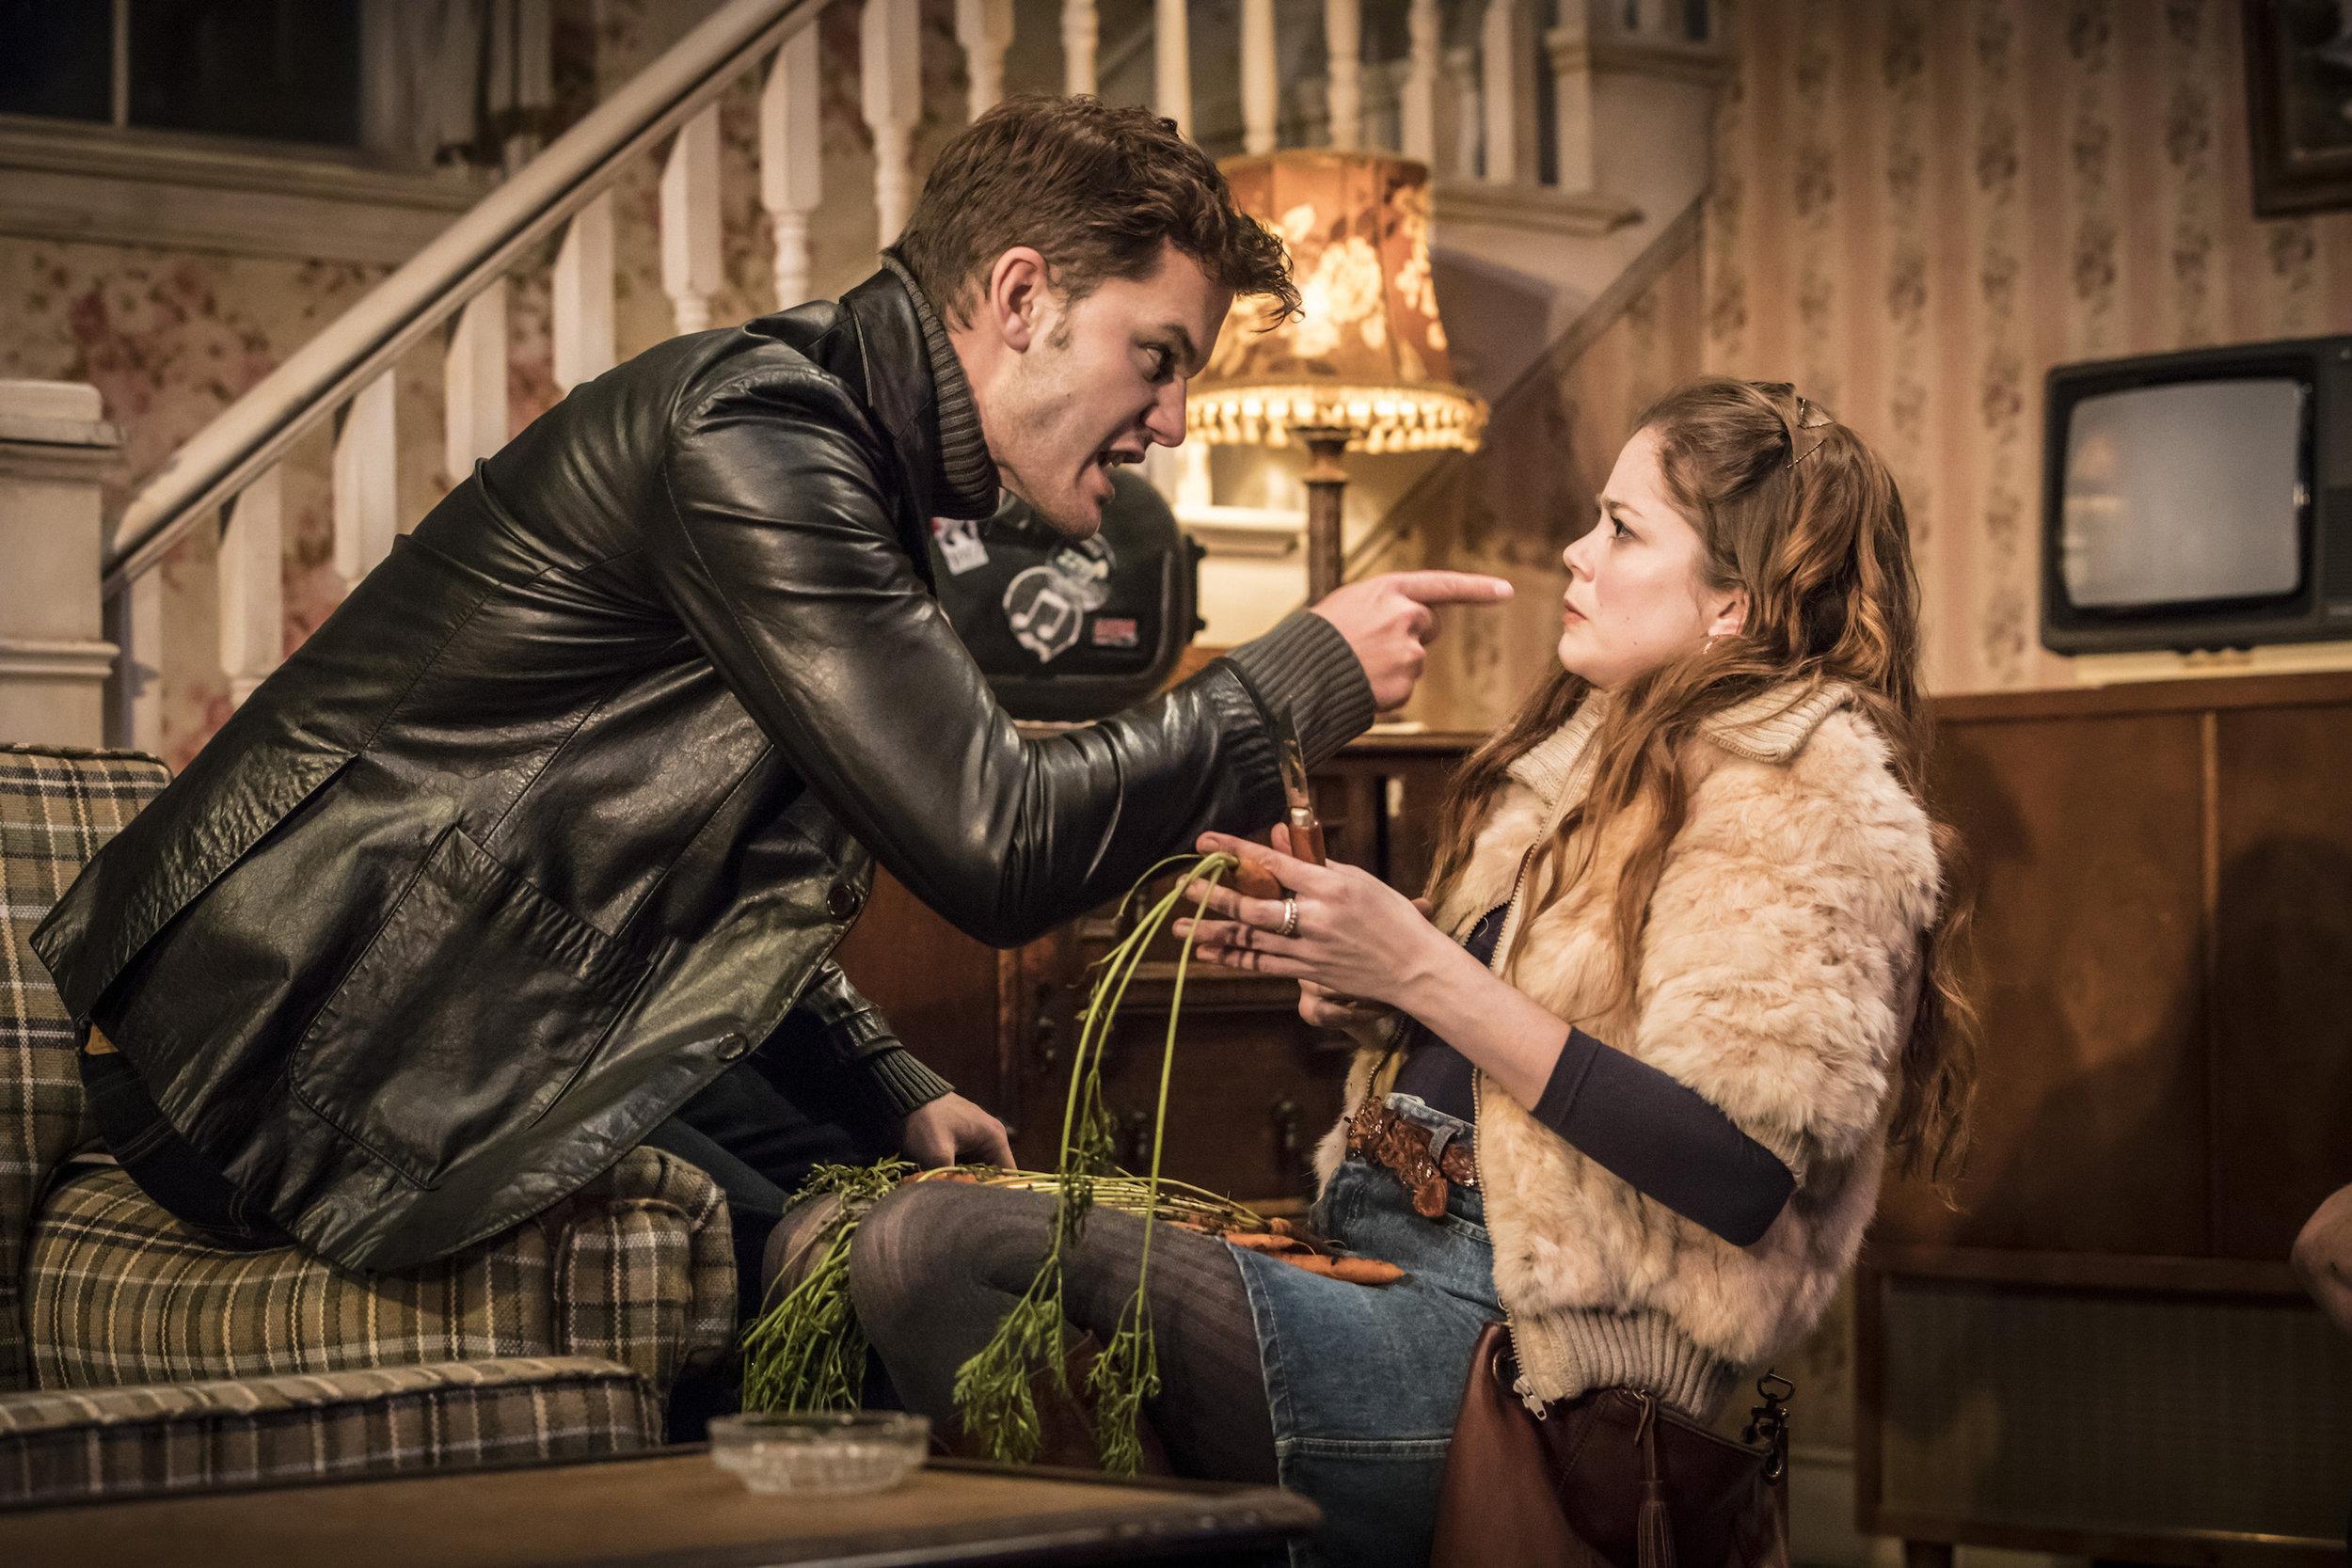 L-R: Jeremy Irvine as Vince, Charlotte Hope as Shelly